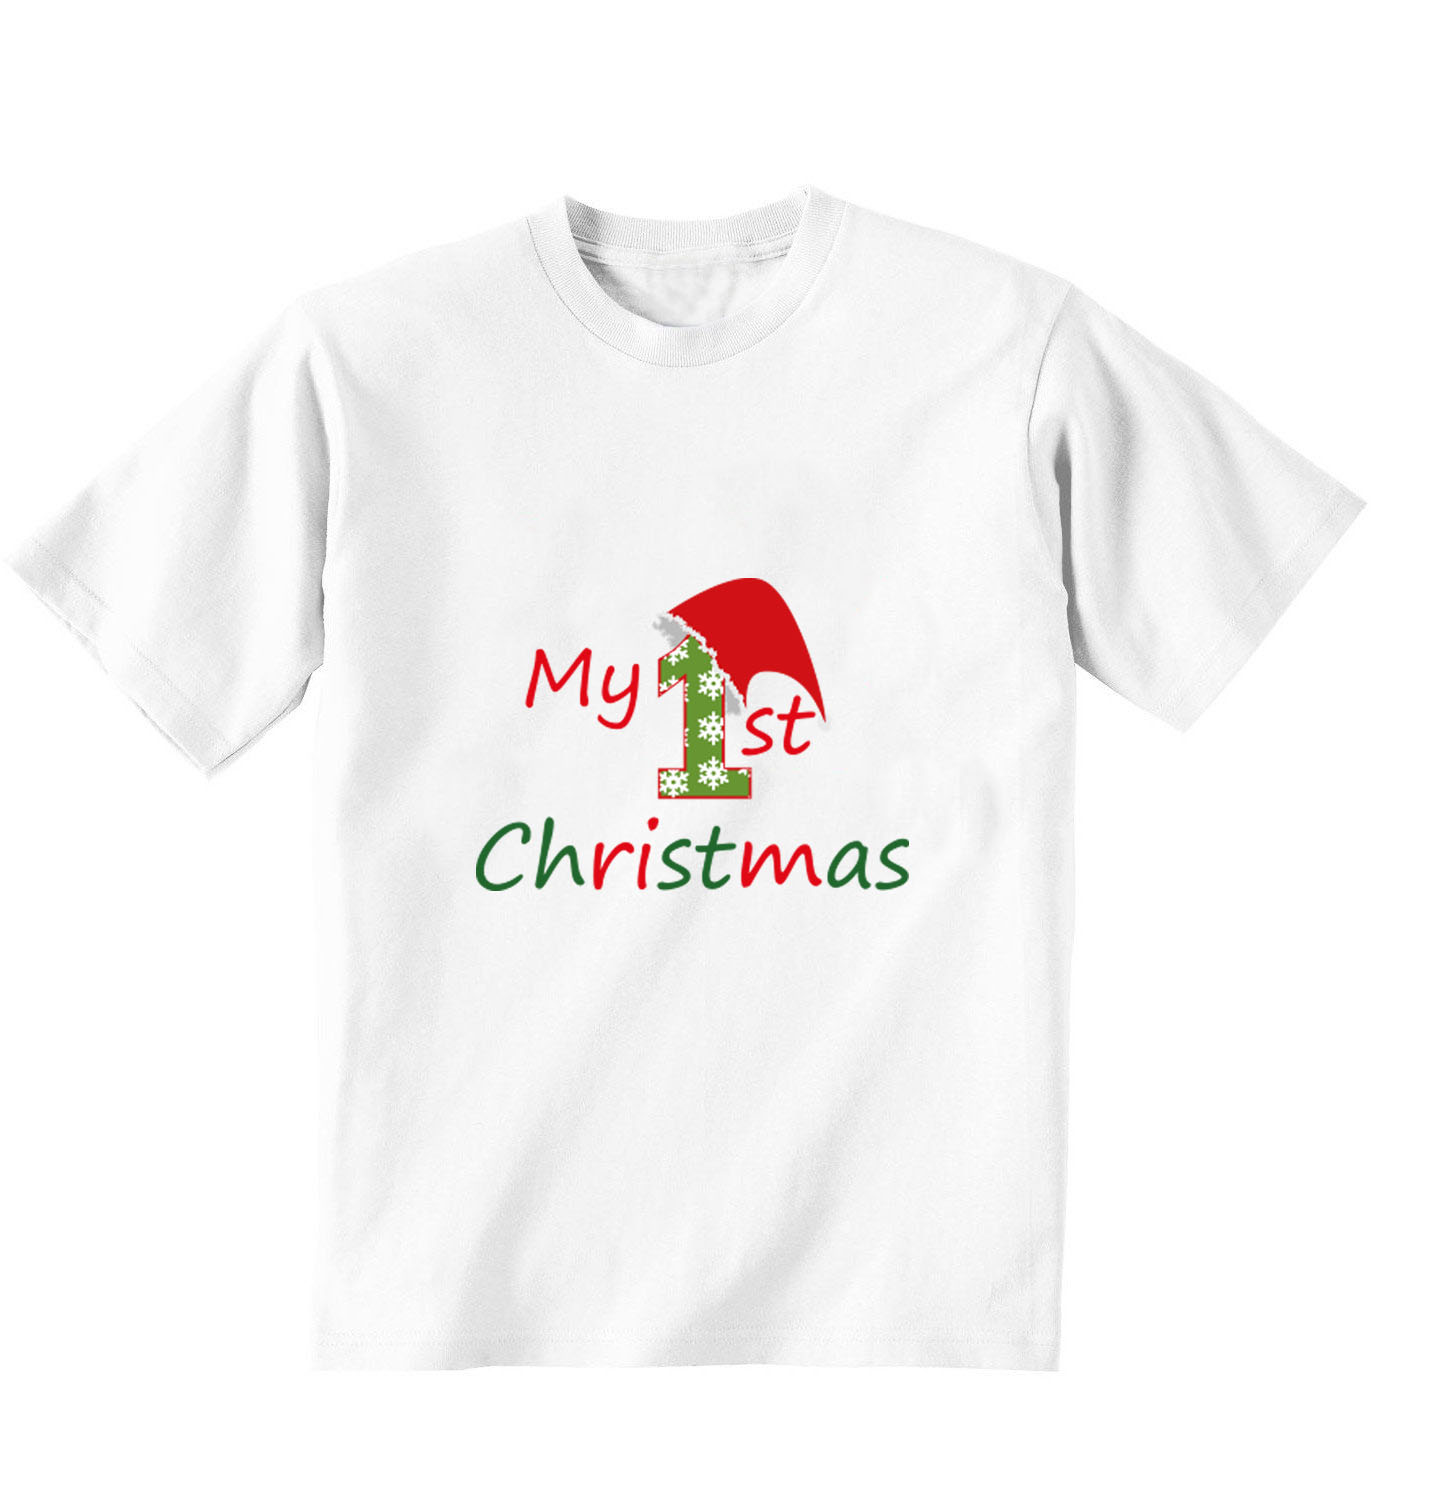 White T-shirt, 100% cotton, machine washable. Age 1-2 years. Print: My 1st Christmas